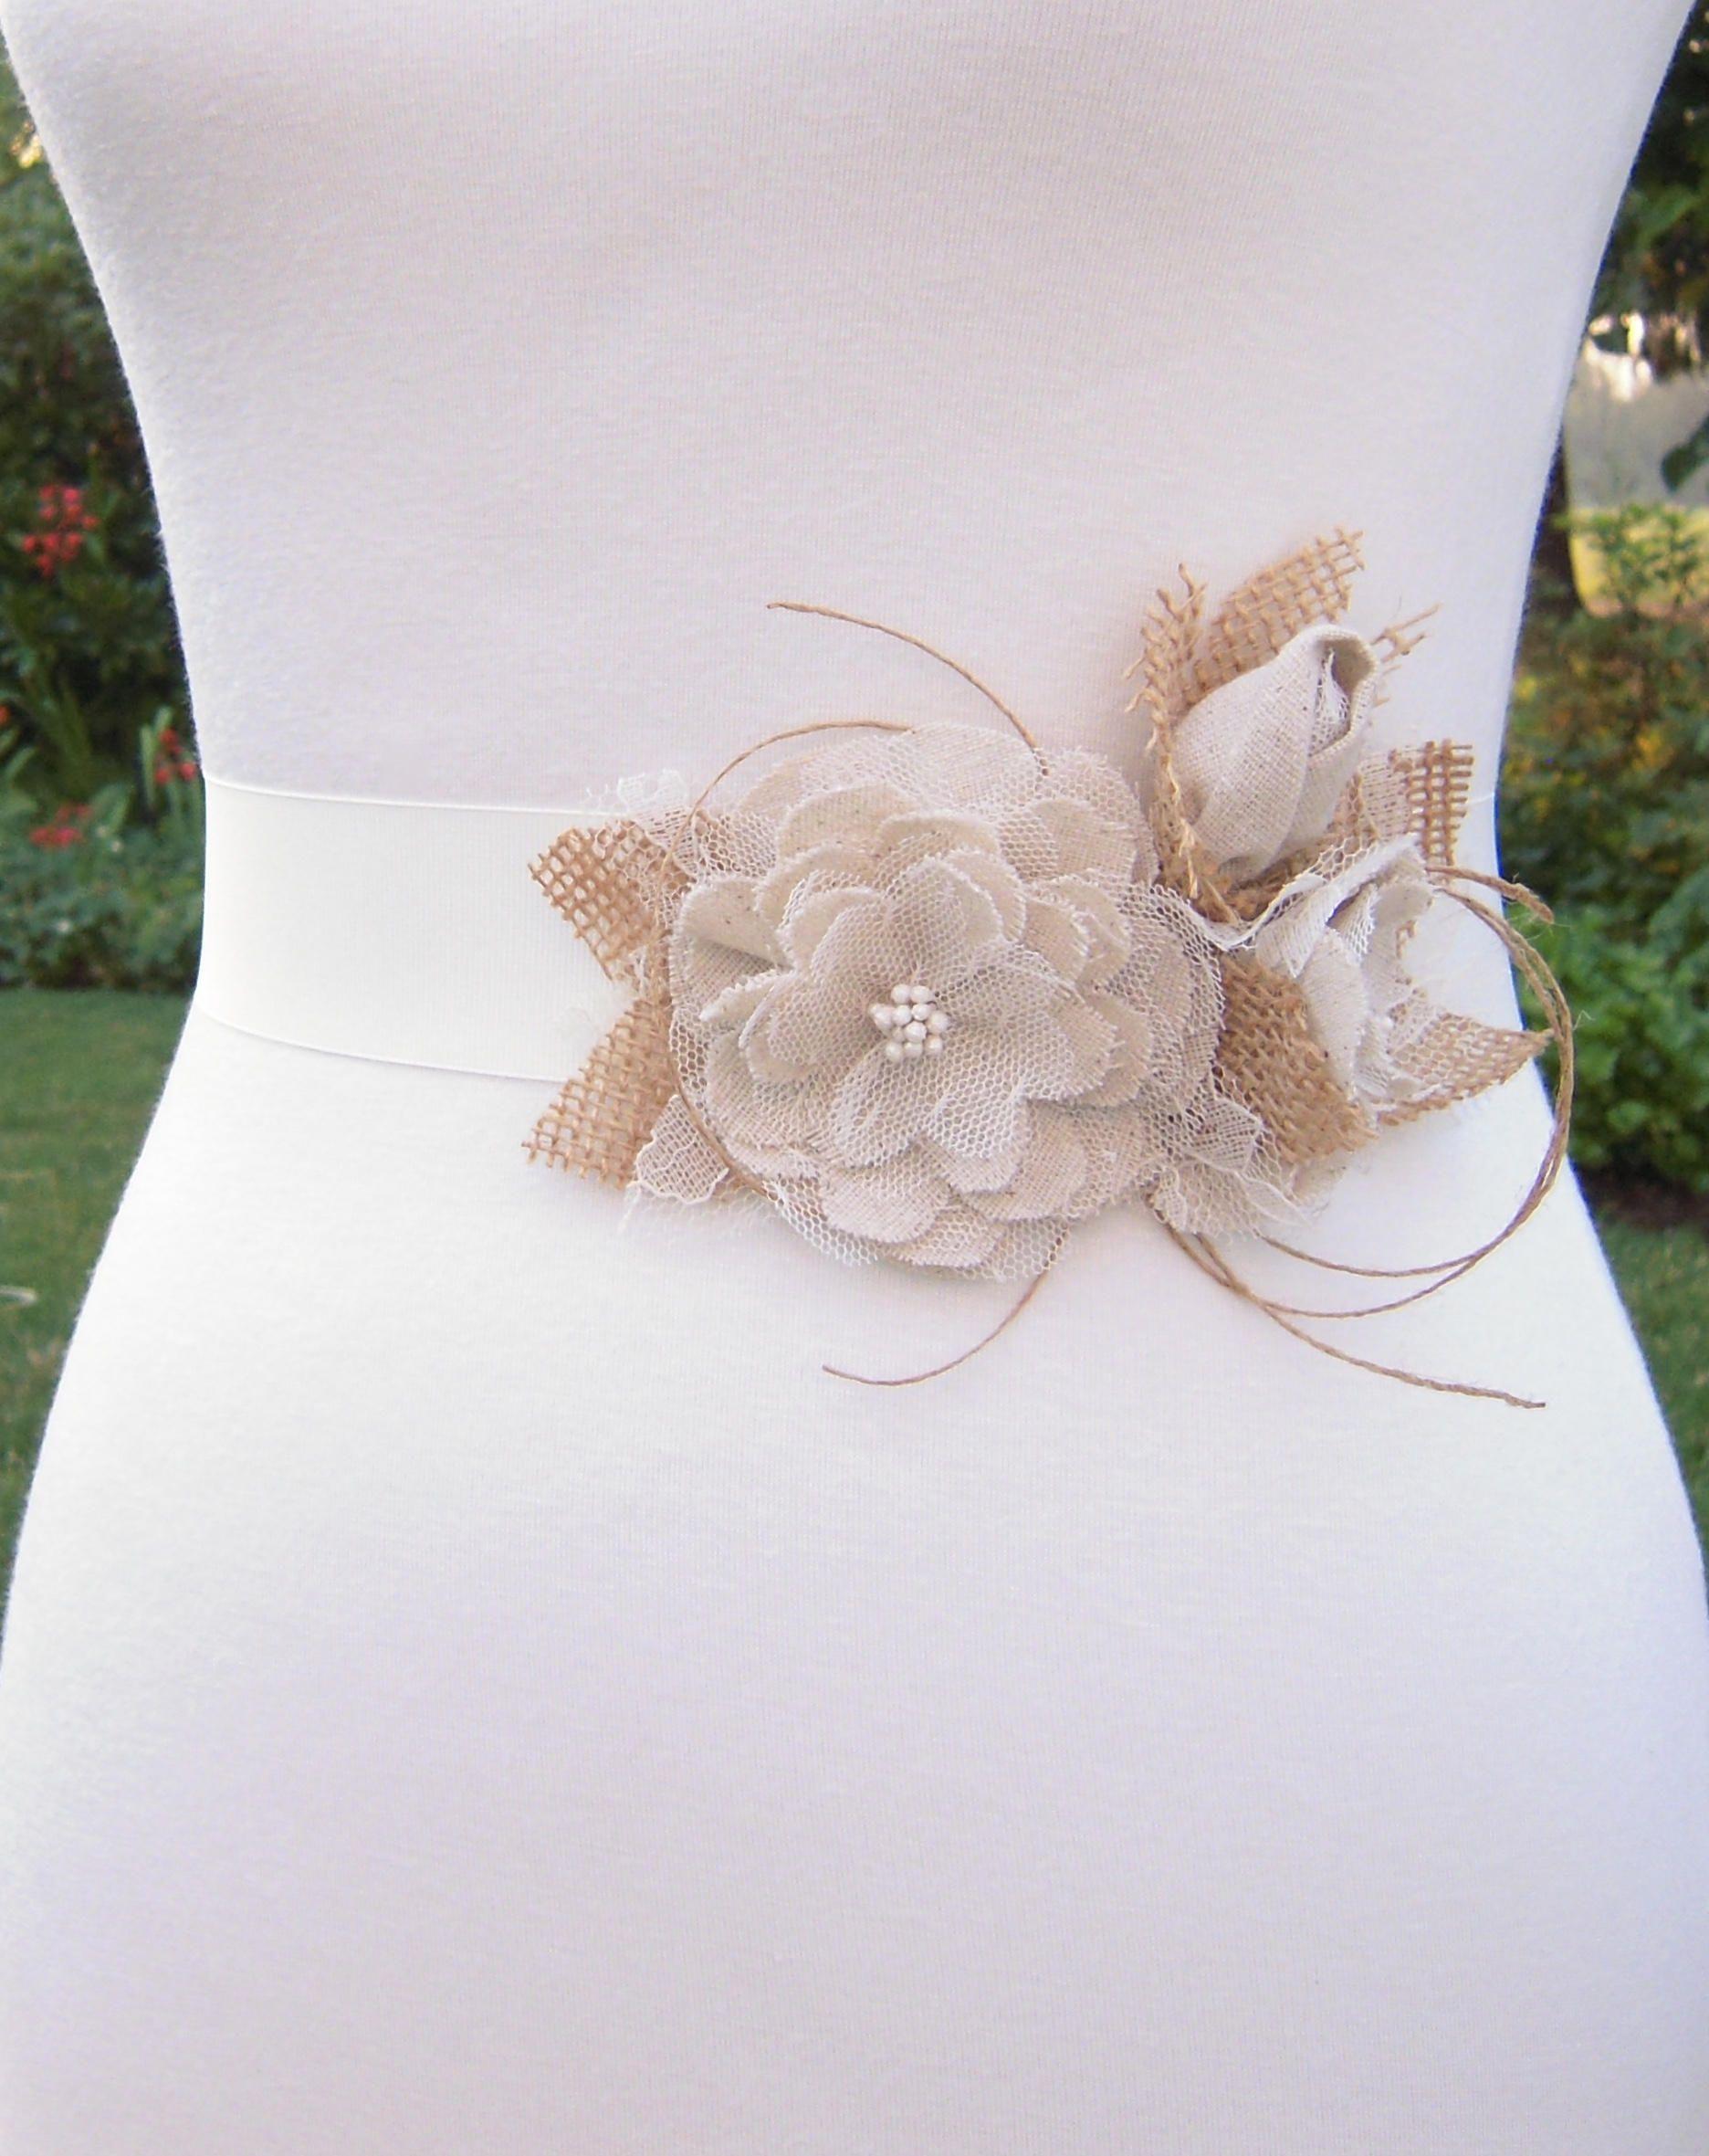 50th wedding anniversary dresses  Rustic Wedding Dress Sash Belt Muslin Roses with Burlap and  Rustic